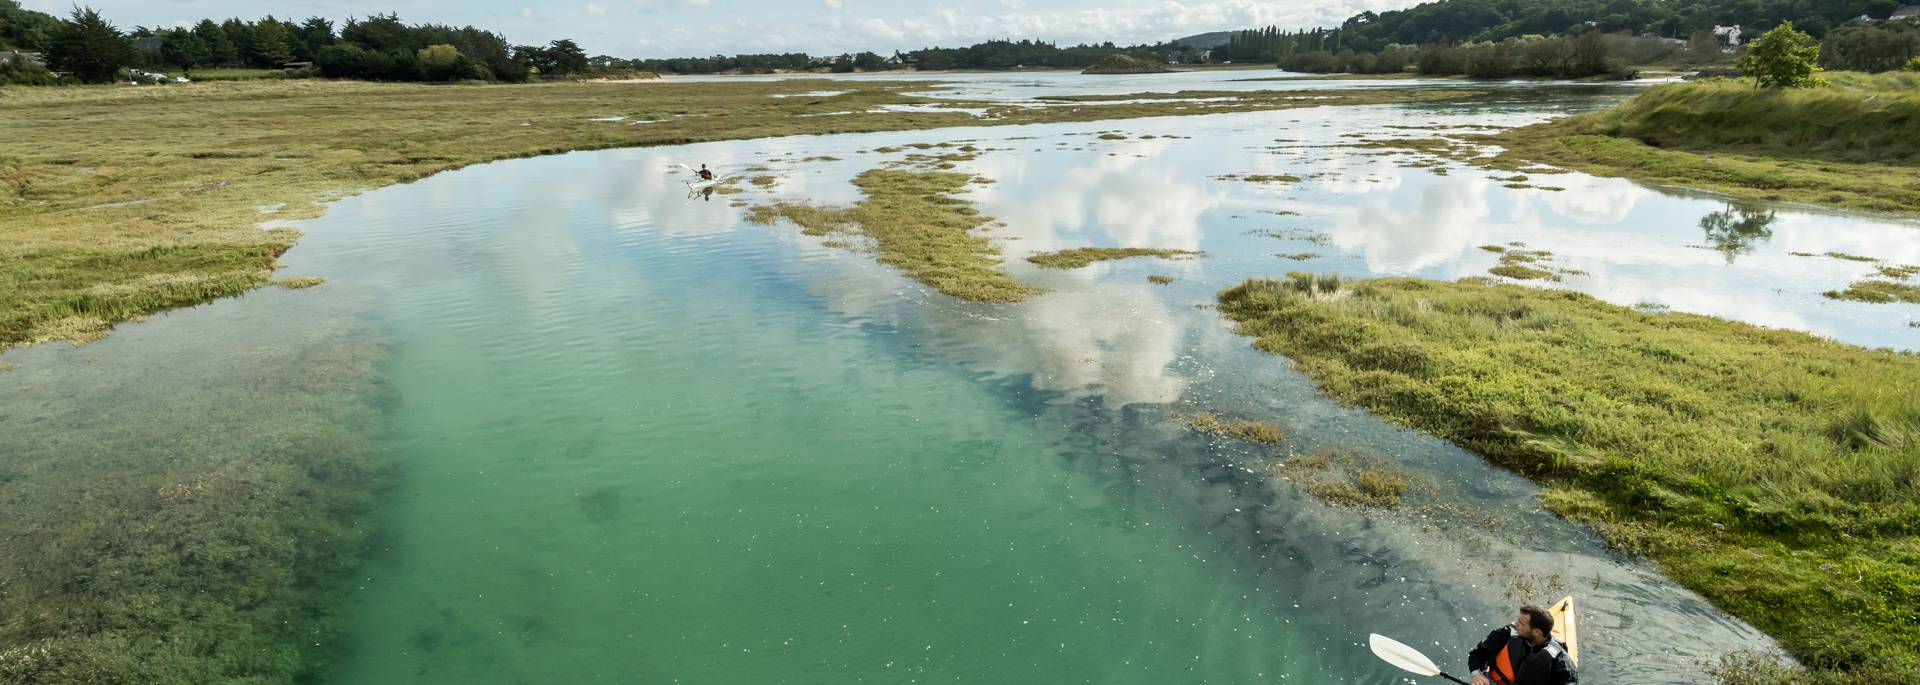 La lagune de Plurien